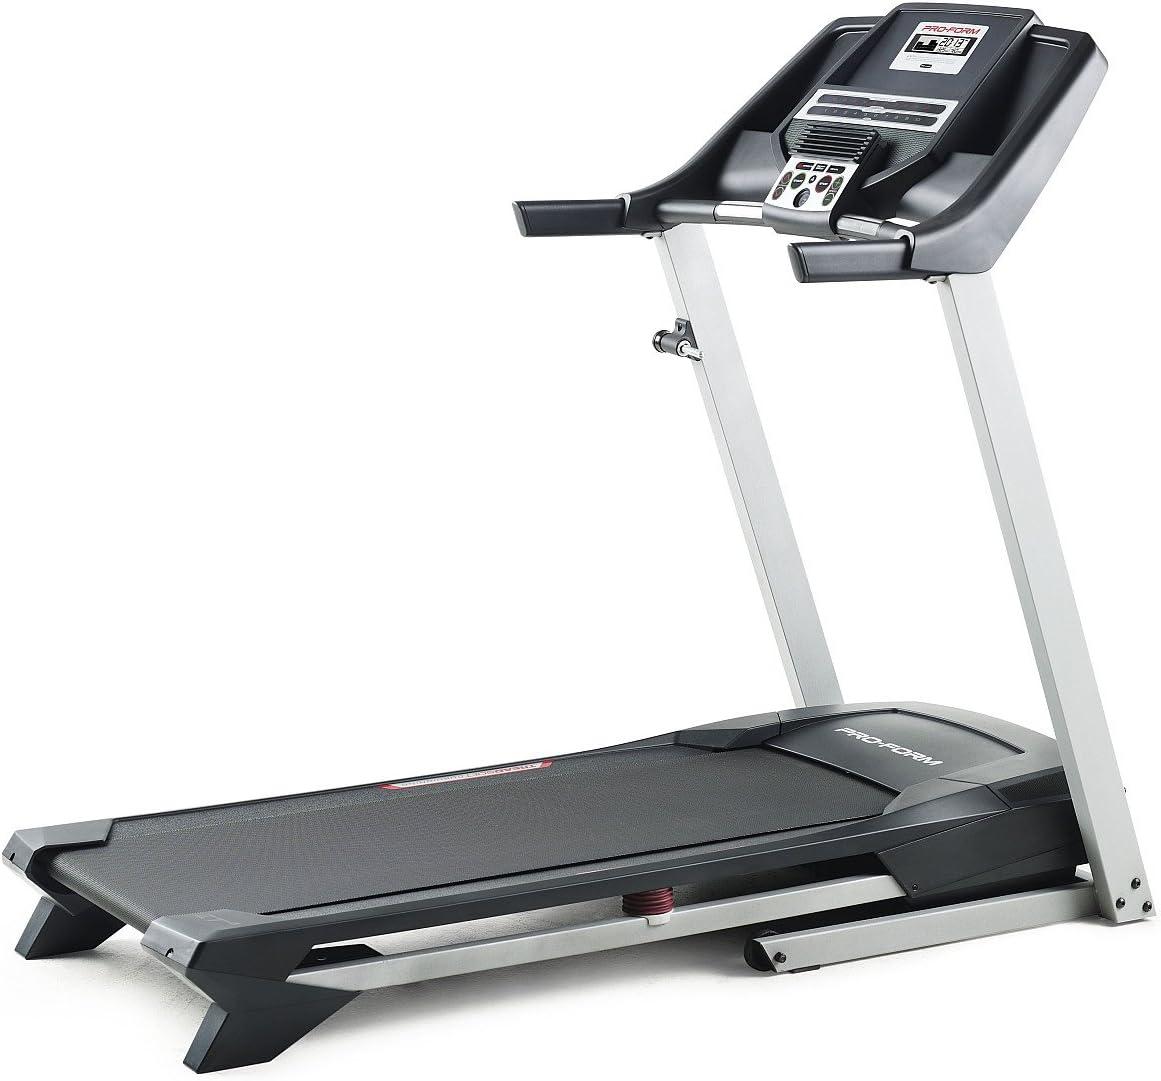 Amazon.com : ProForm ZT4 Folding Home Gym Workout Fitness ...